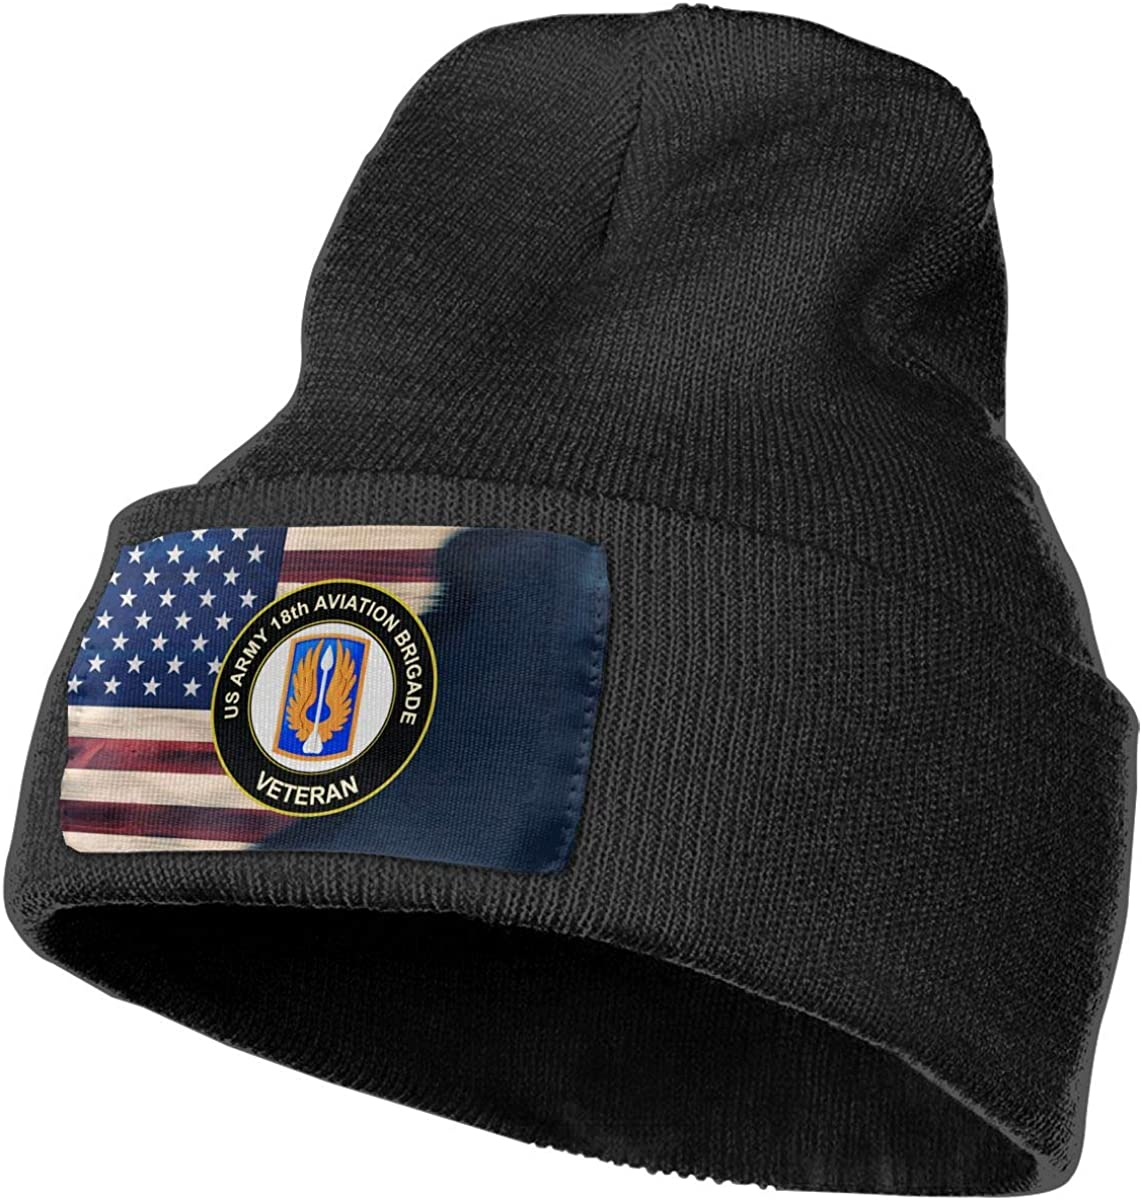 FORDSAN CP US Army 18th Aviation Brigade Veteran Mens Beanie Cap Skull Cap Winter Warm Knitting Hats.